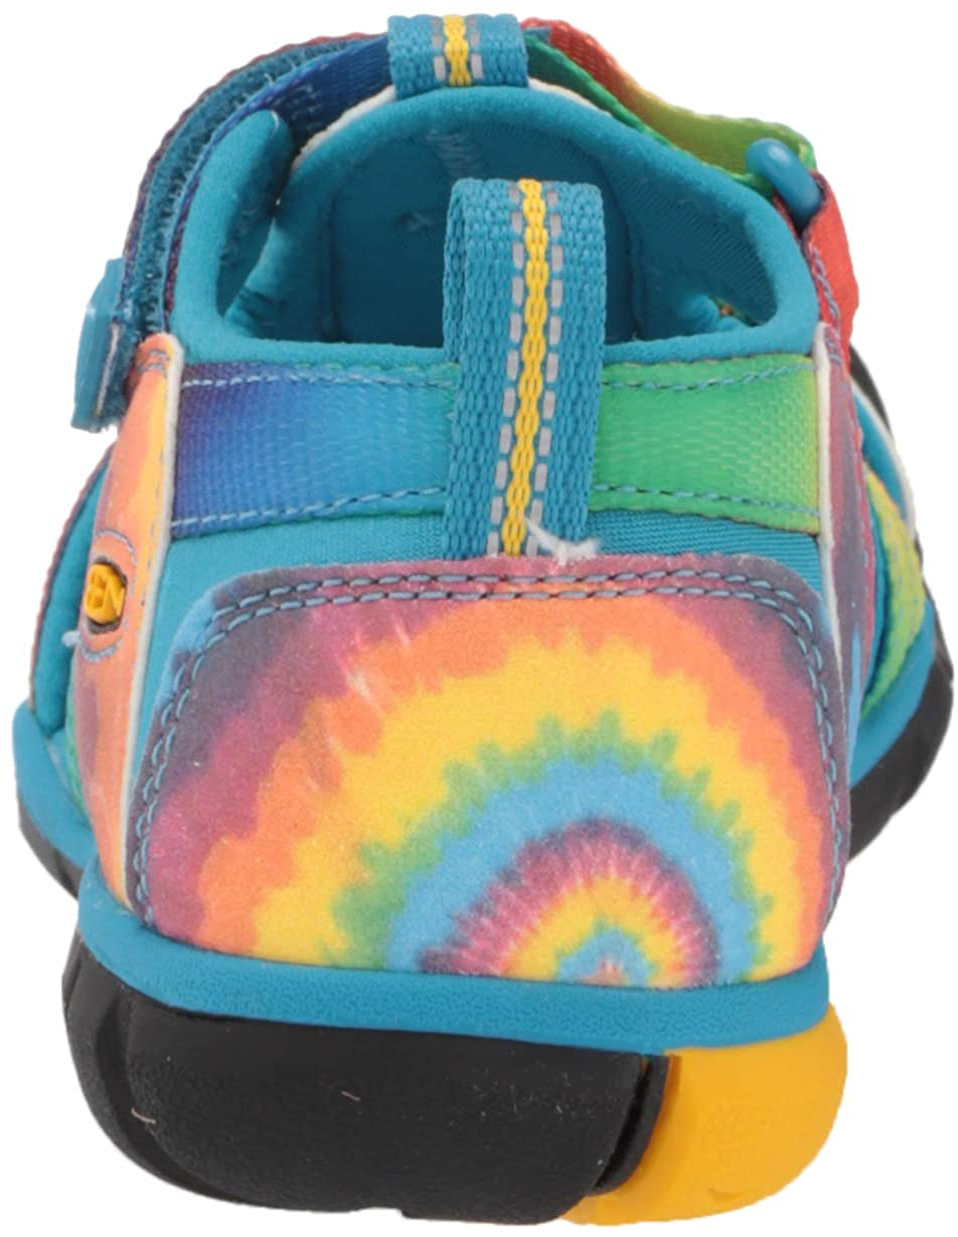 KEEN Seacamp 2 CNX Closed Toe Sandal 12 US Unisex Little Kid Vivid Blue//Original Tie Dye